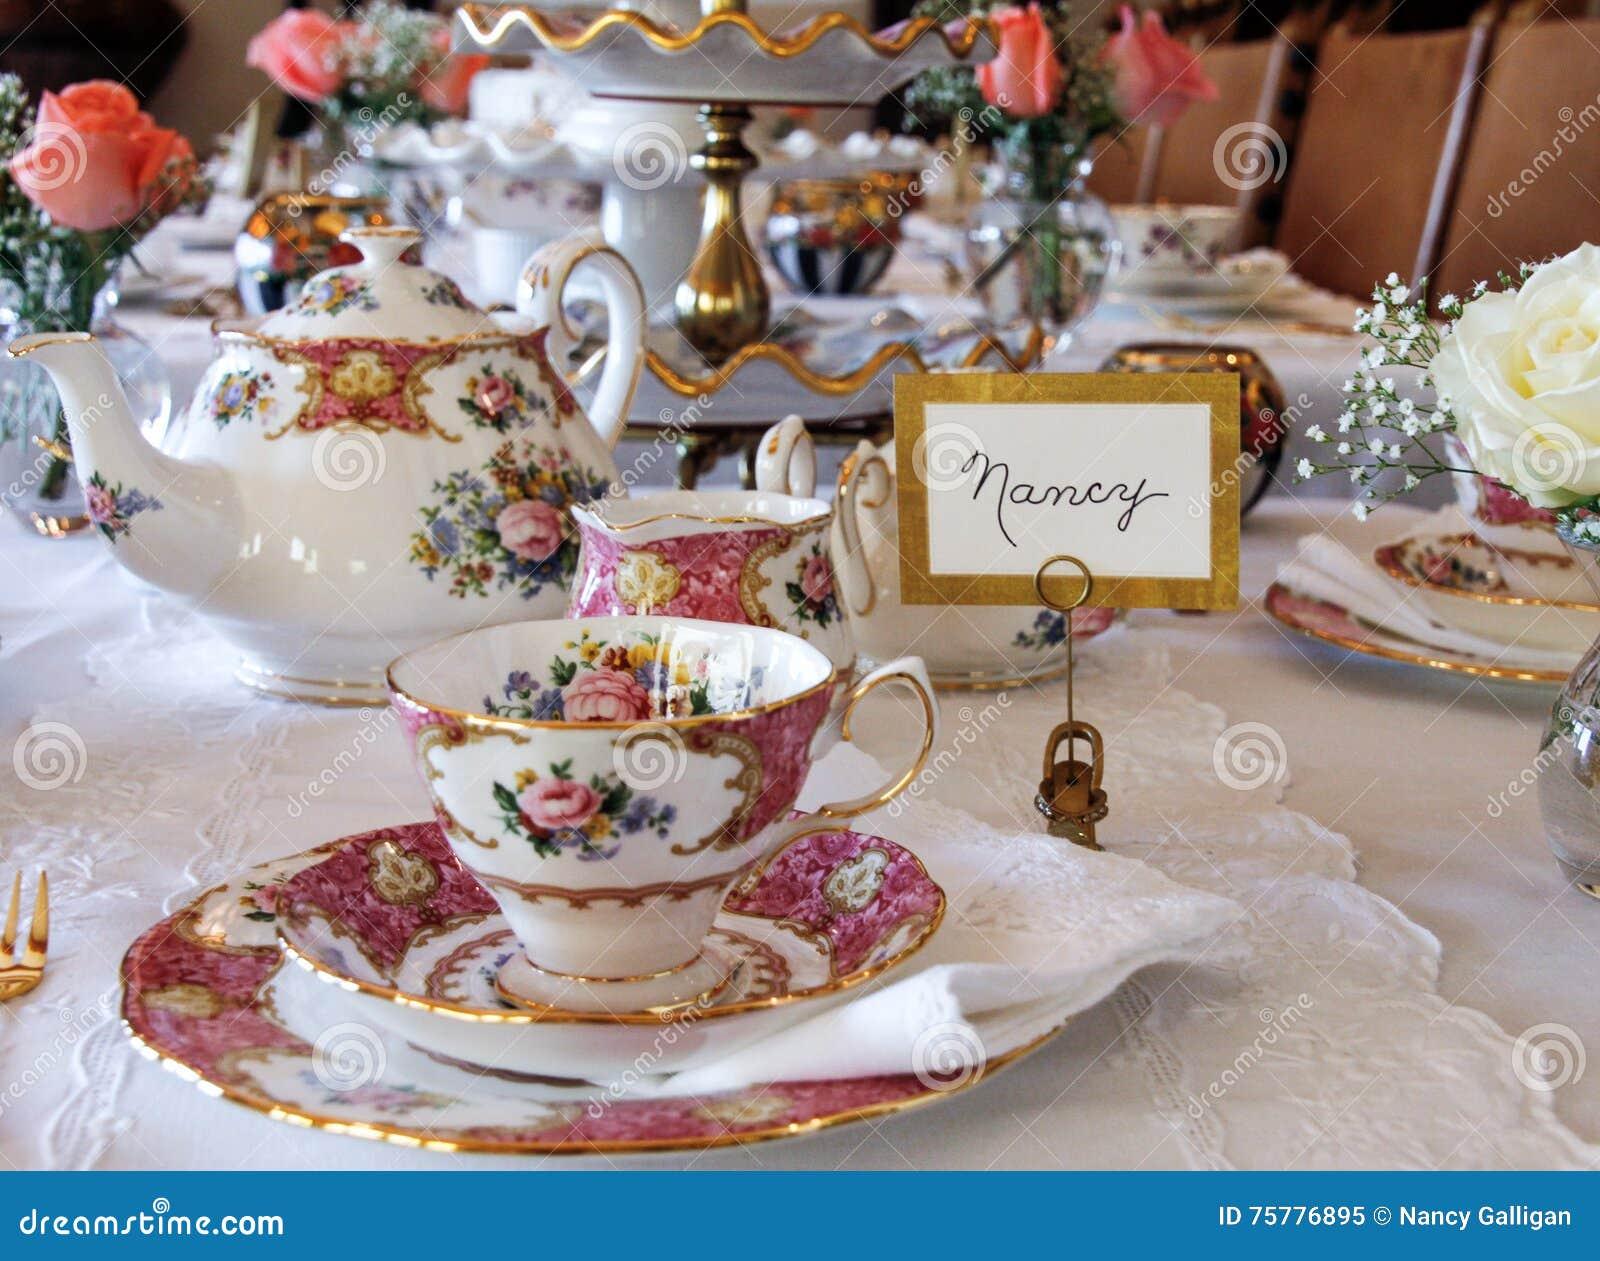 tea table settings tables - photo #47